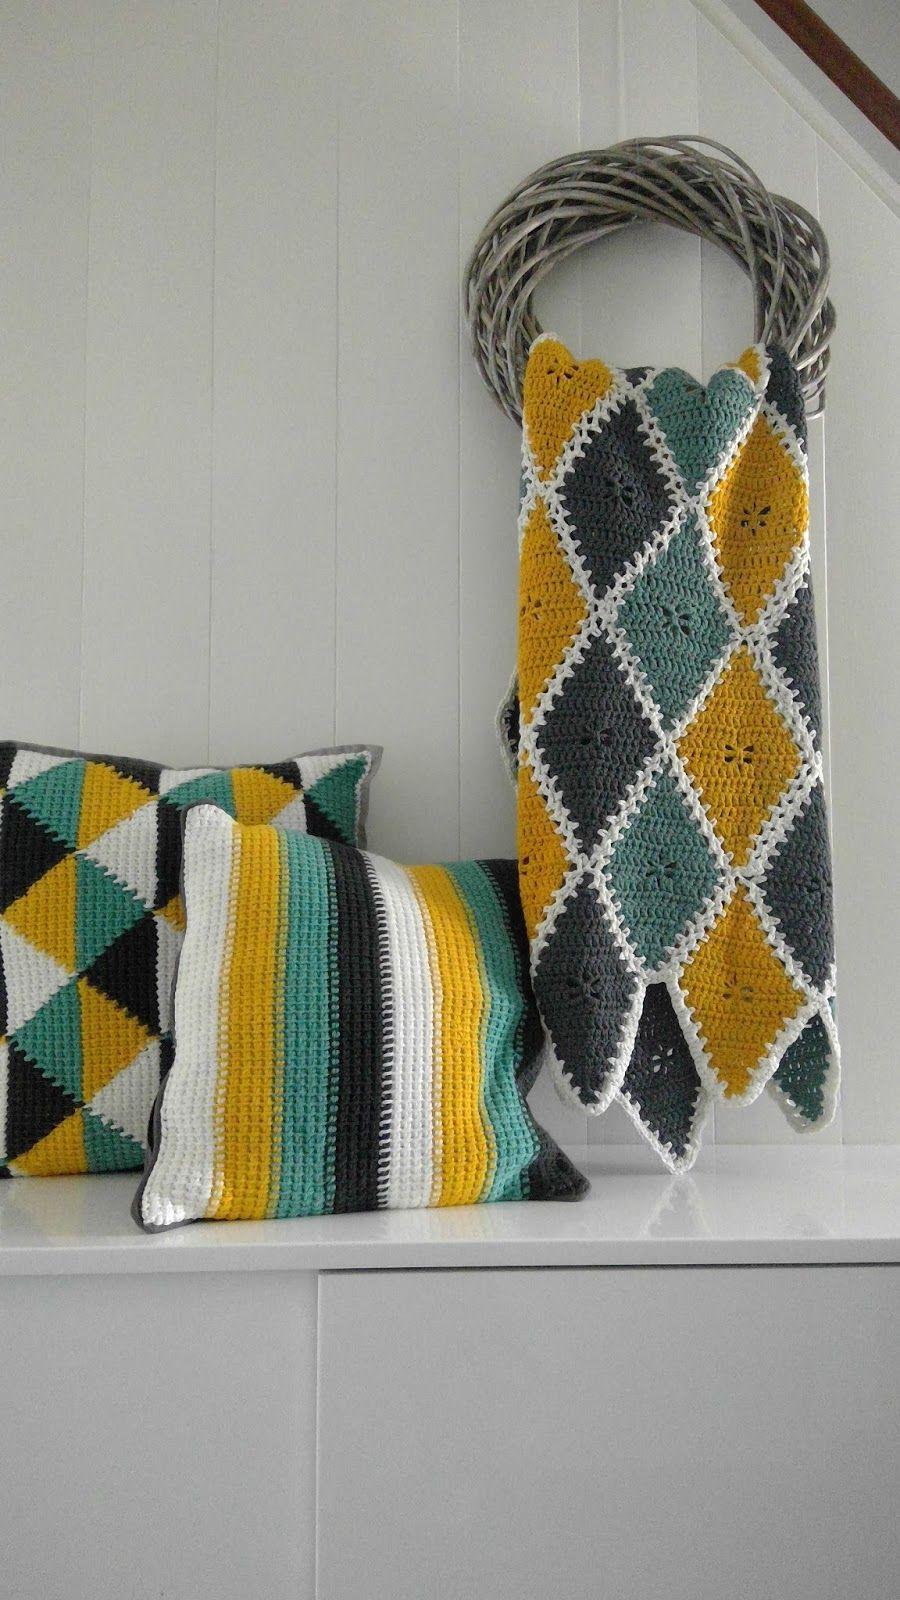 Haakjuf crochet ideas pinterest crochet knitting and crochet